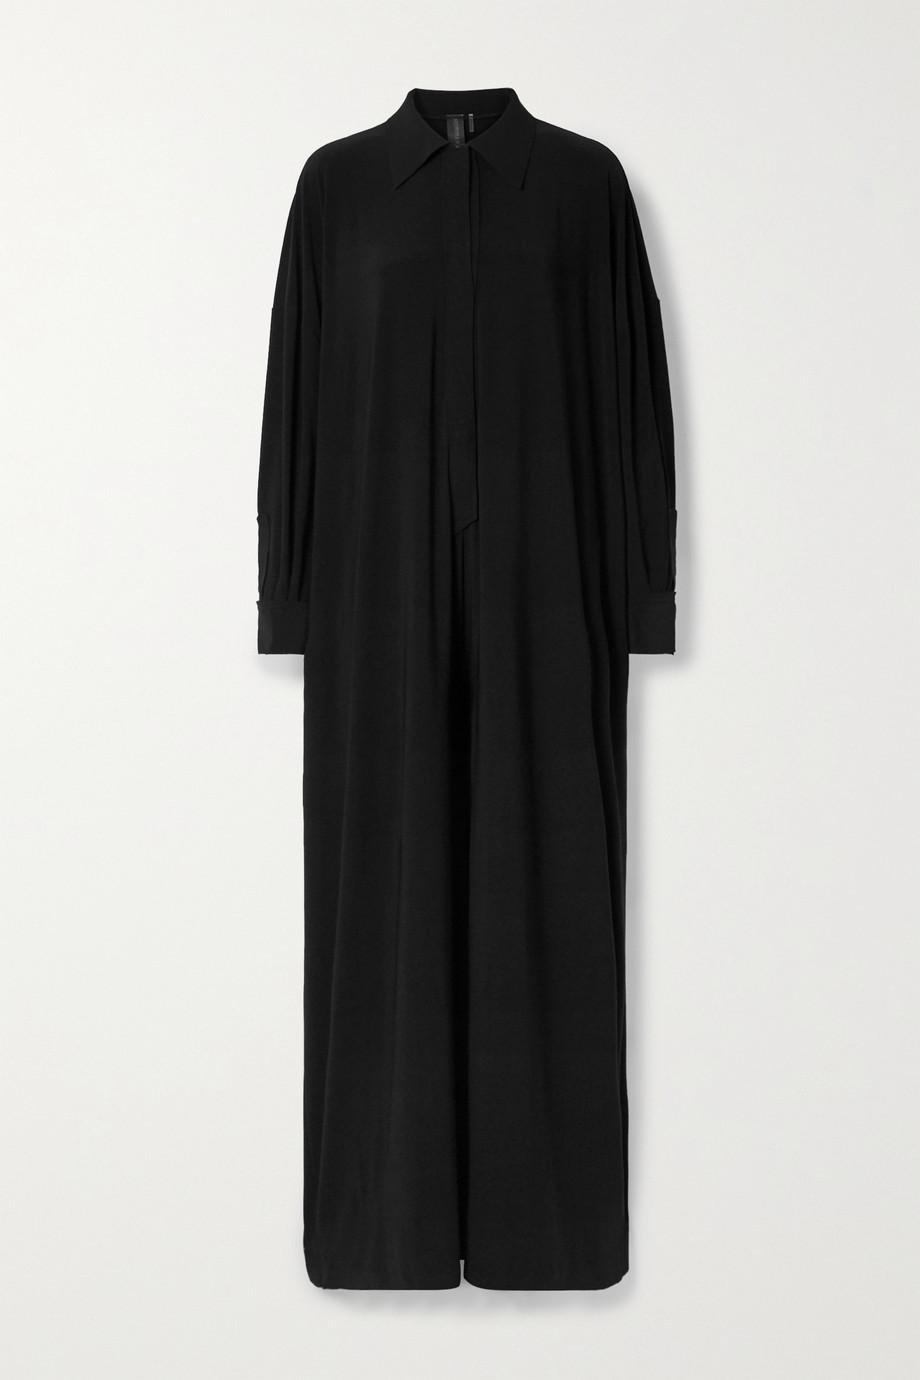 Norma Kamali 弹力平纹布连身裤